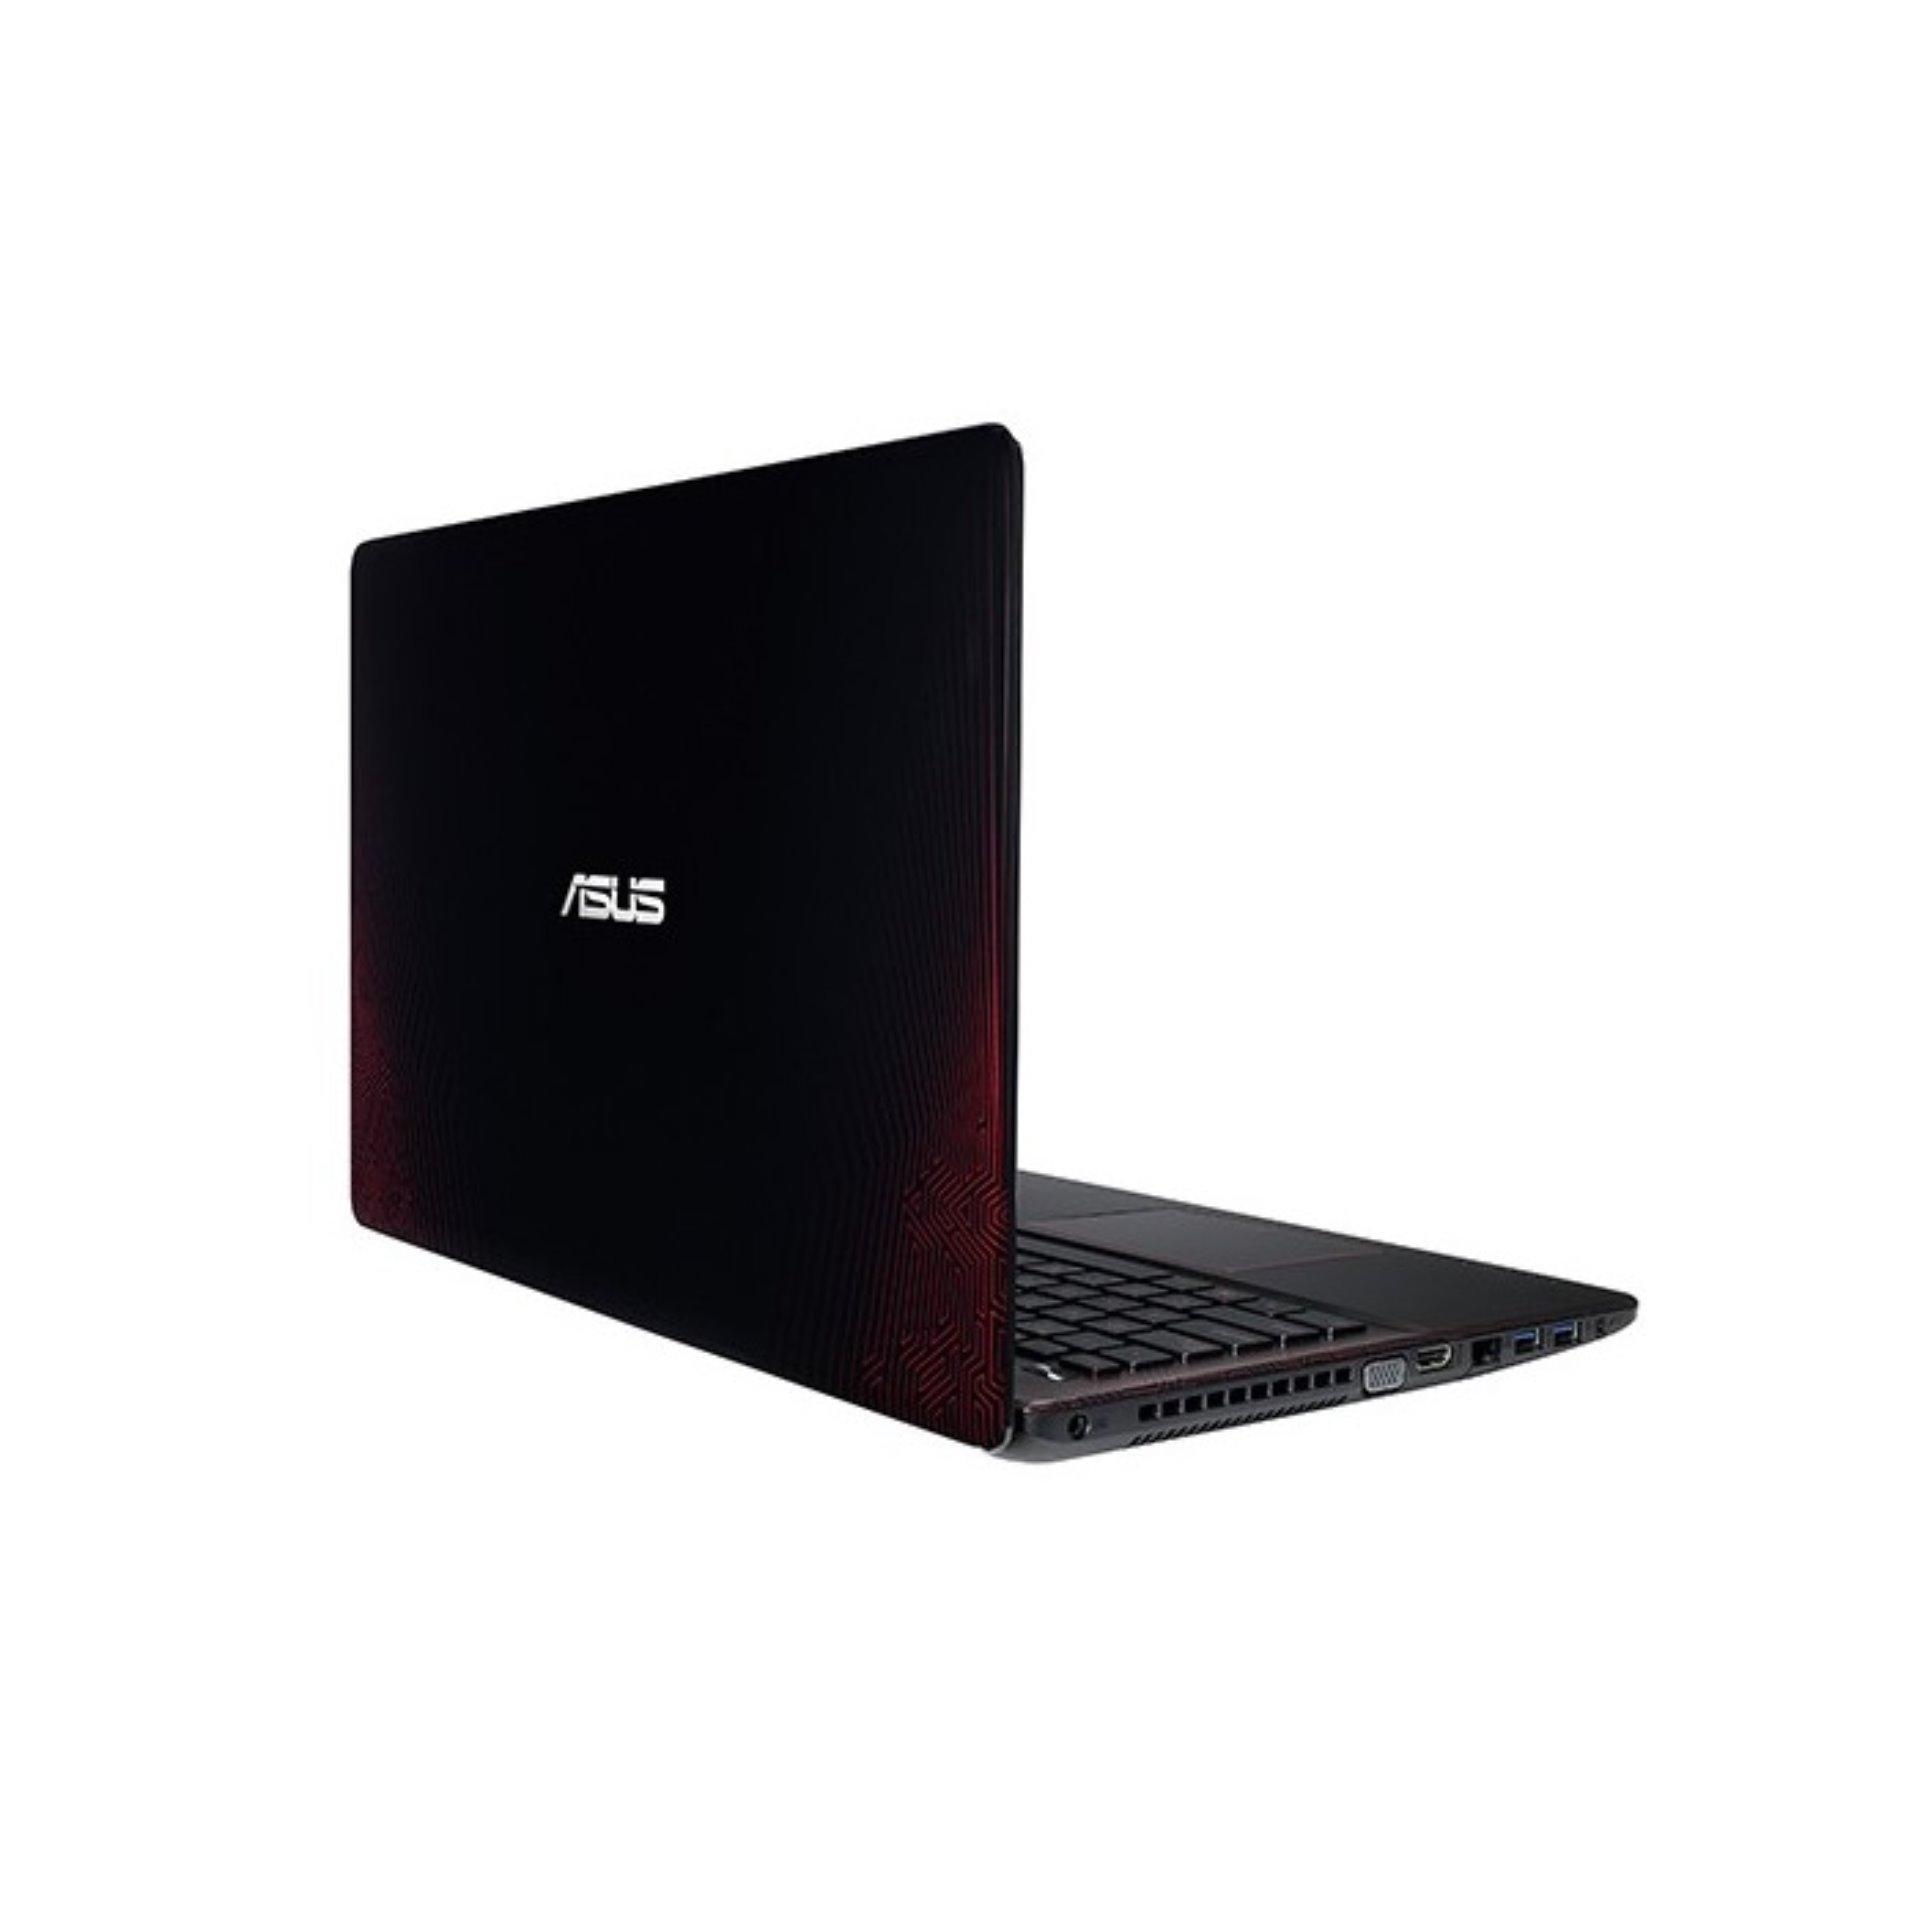 Promo Harga Asus E202sa Fd111t Black N3060 2gb 500gb 116 Hd Win10 Vivobook Flip Tp201sa Fv0027d Laptop Gold Inch Touch Qc N3710 Dos Penawaran X550vx Dm701 Red Termurah